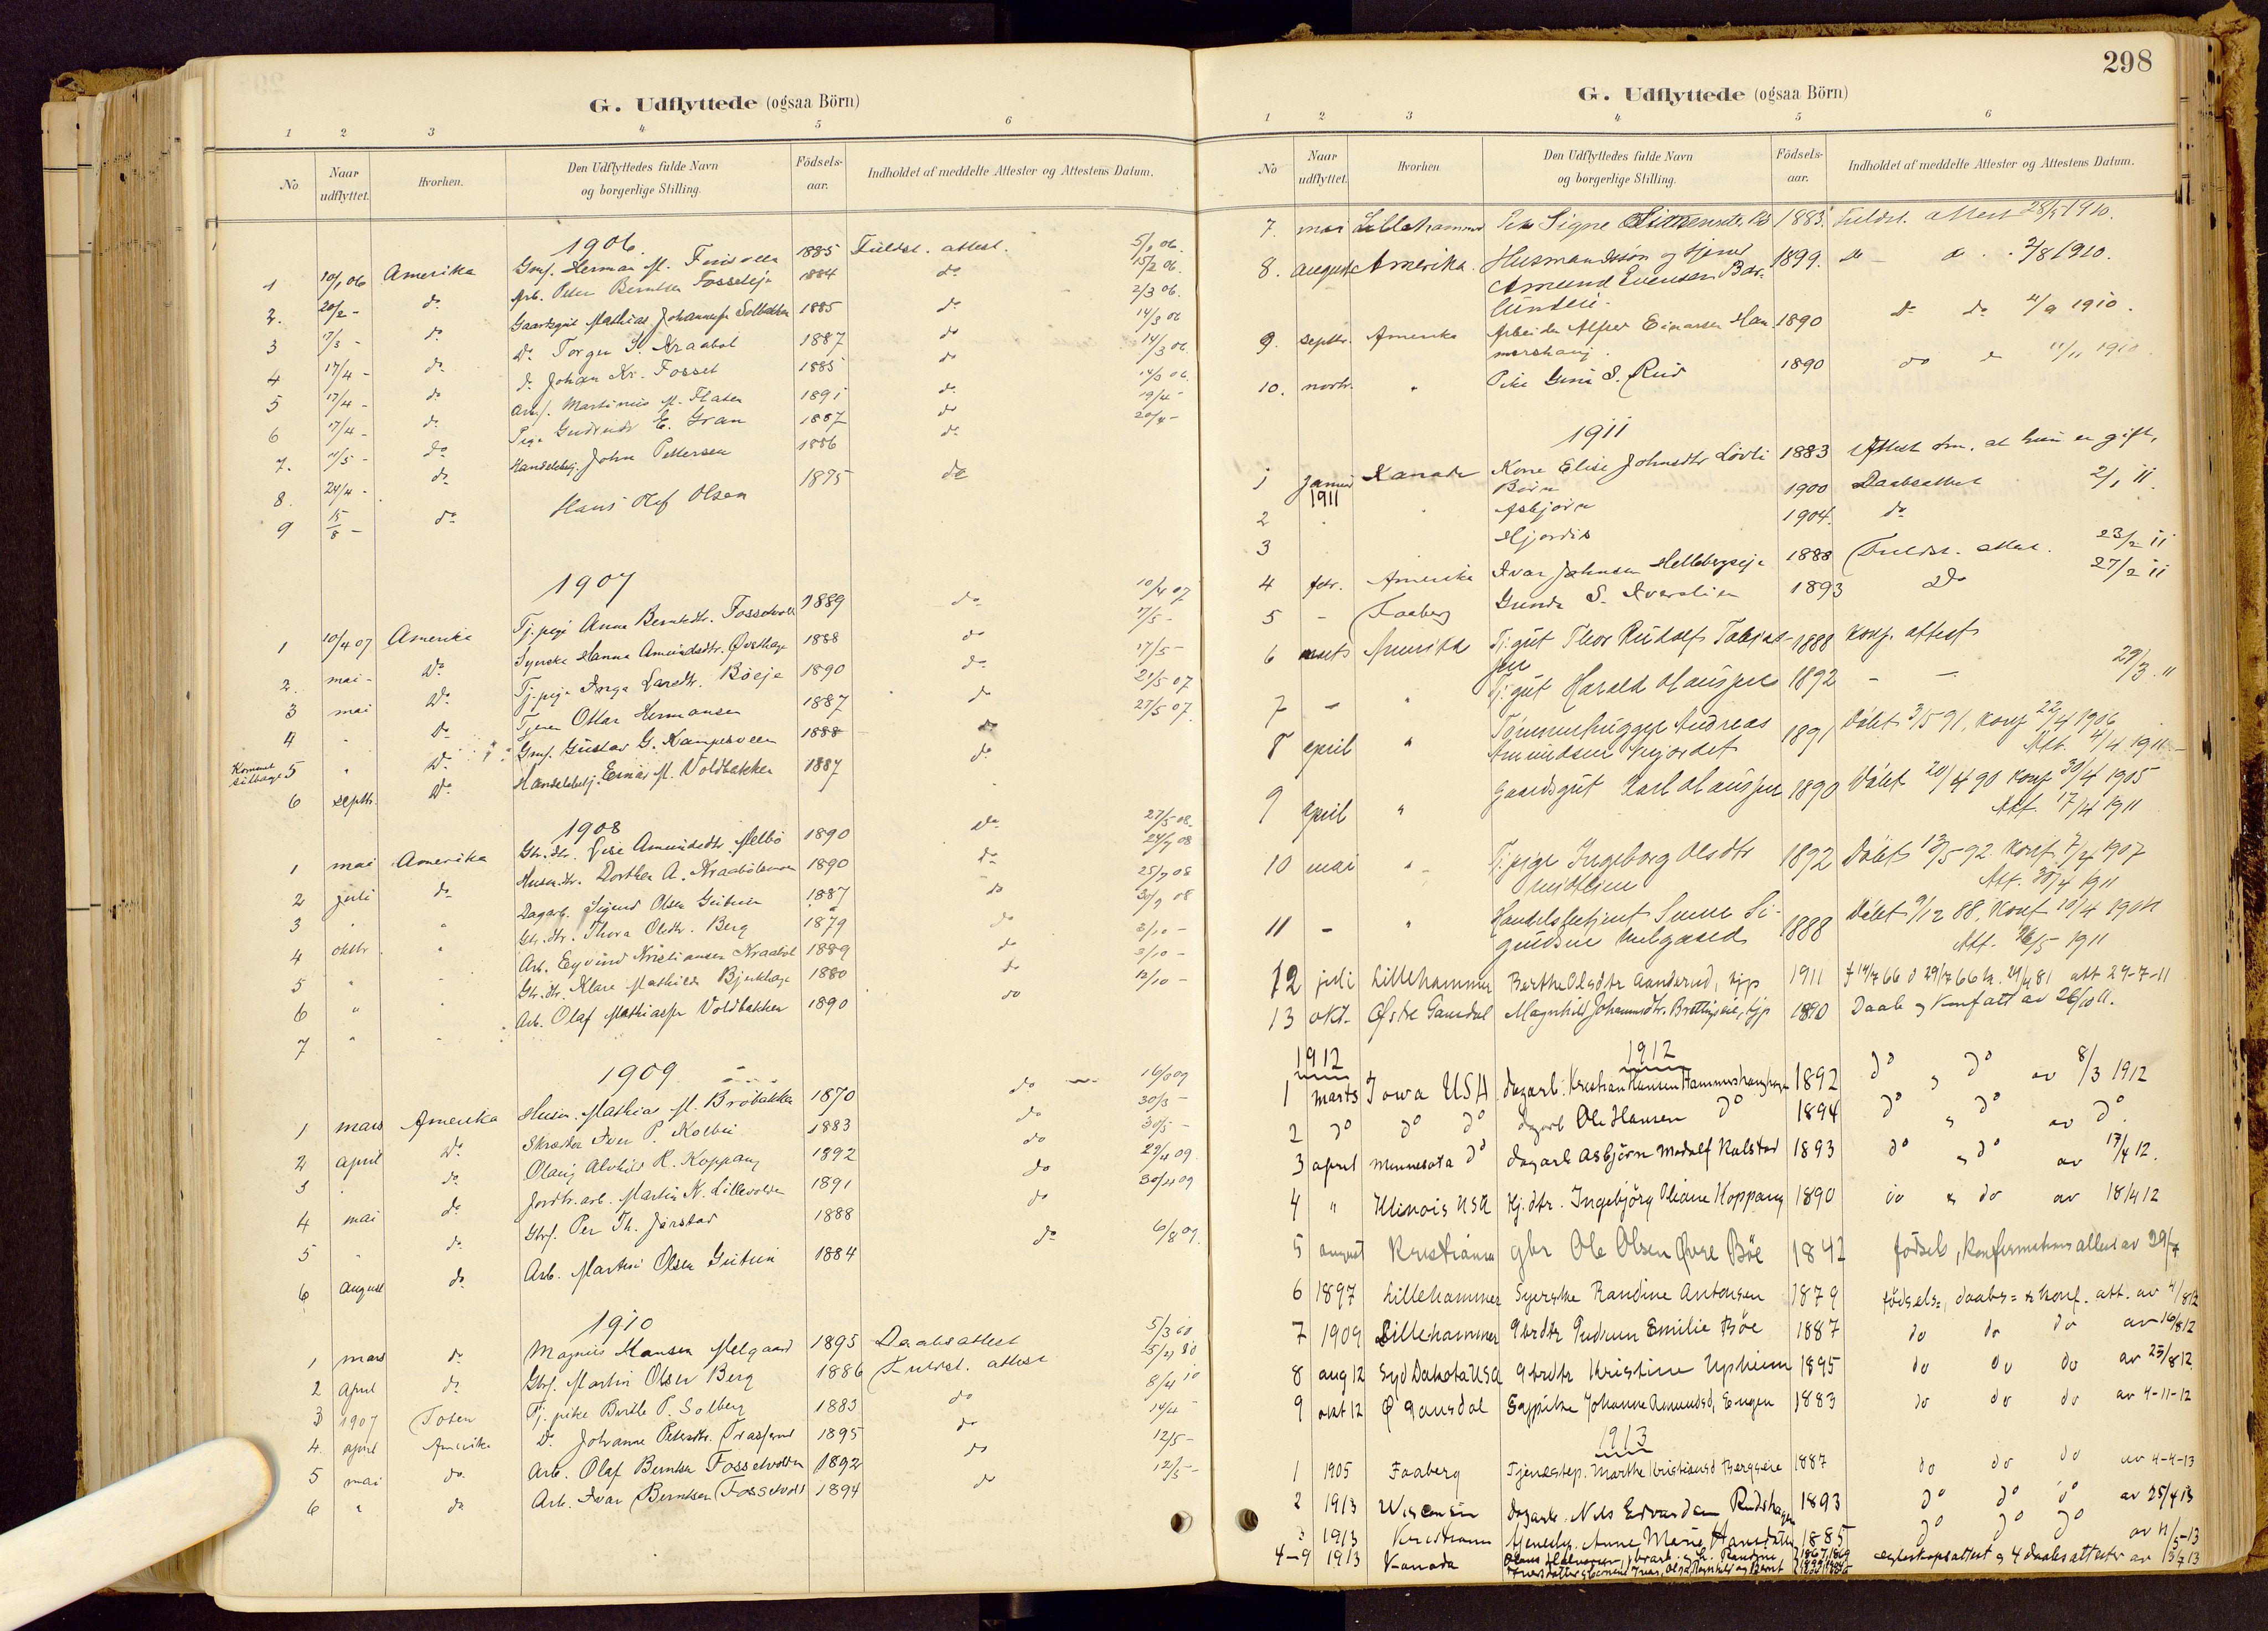 SAH, Vestre Gausdal prestekontor, Ministerialbok nr. 1, 1887-1914, s. 298